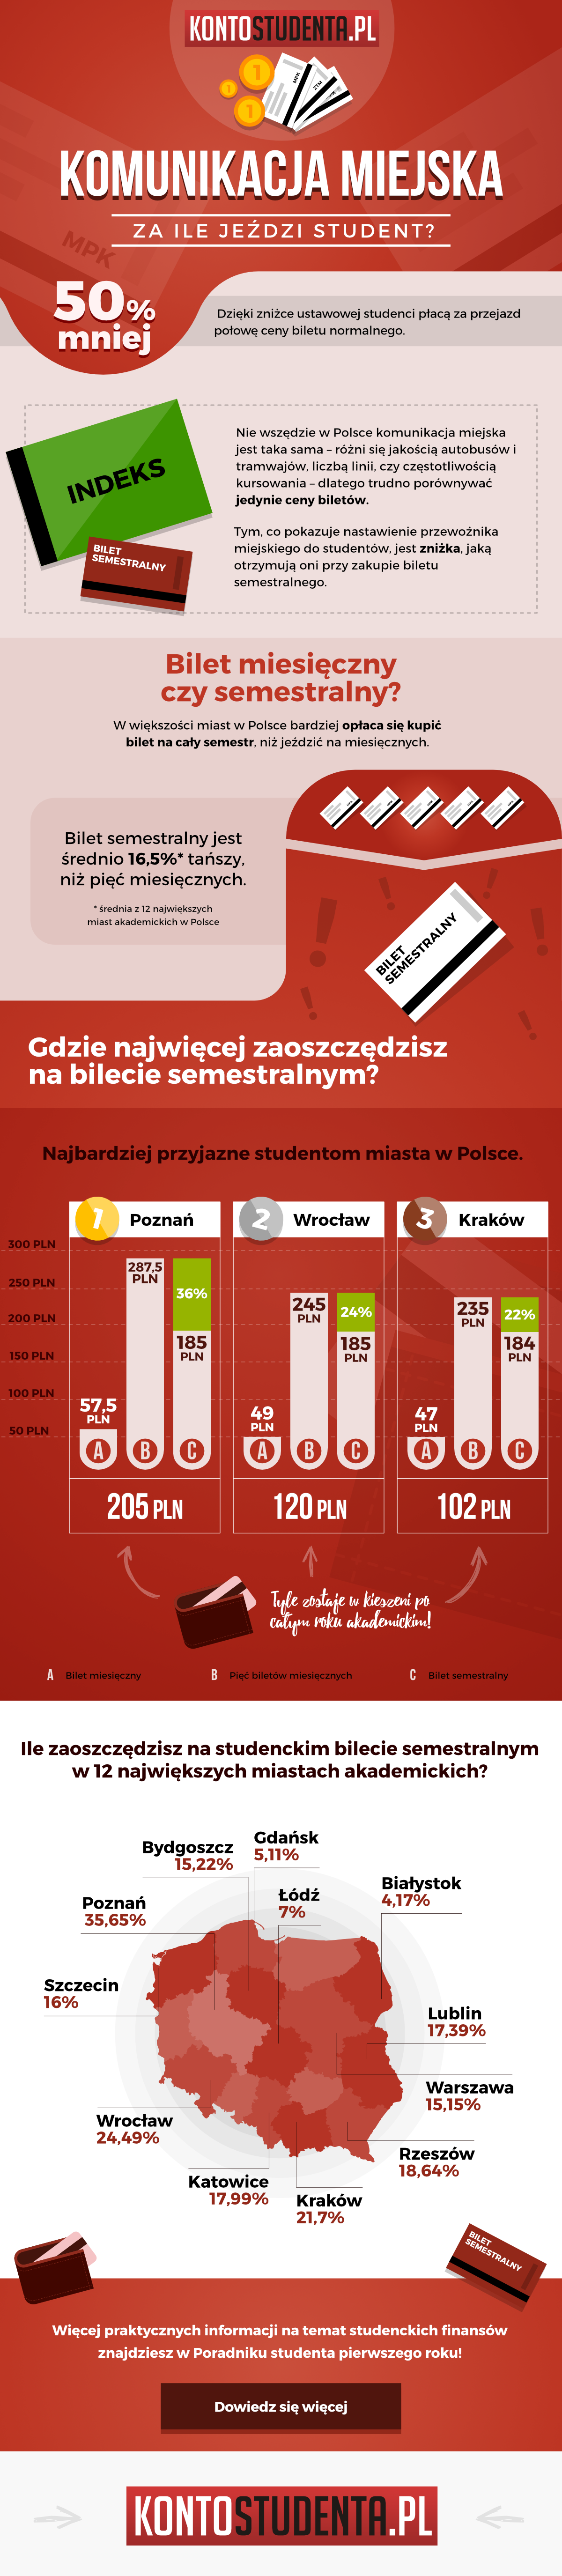 Komunikacja miejska - infografika